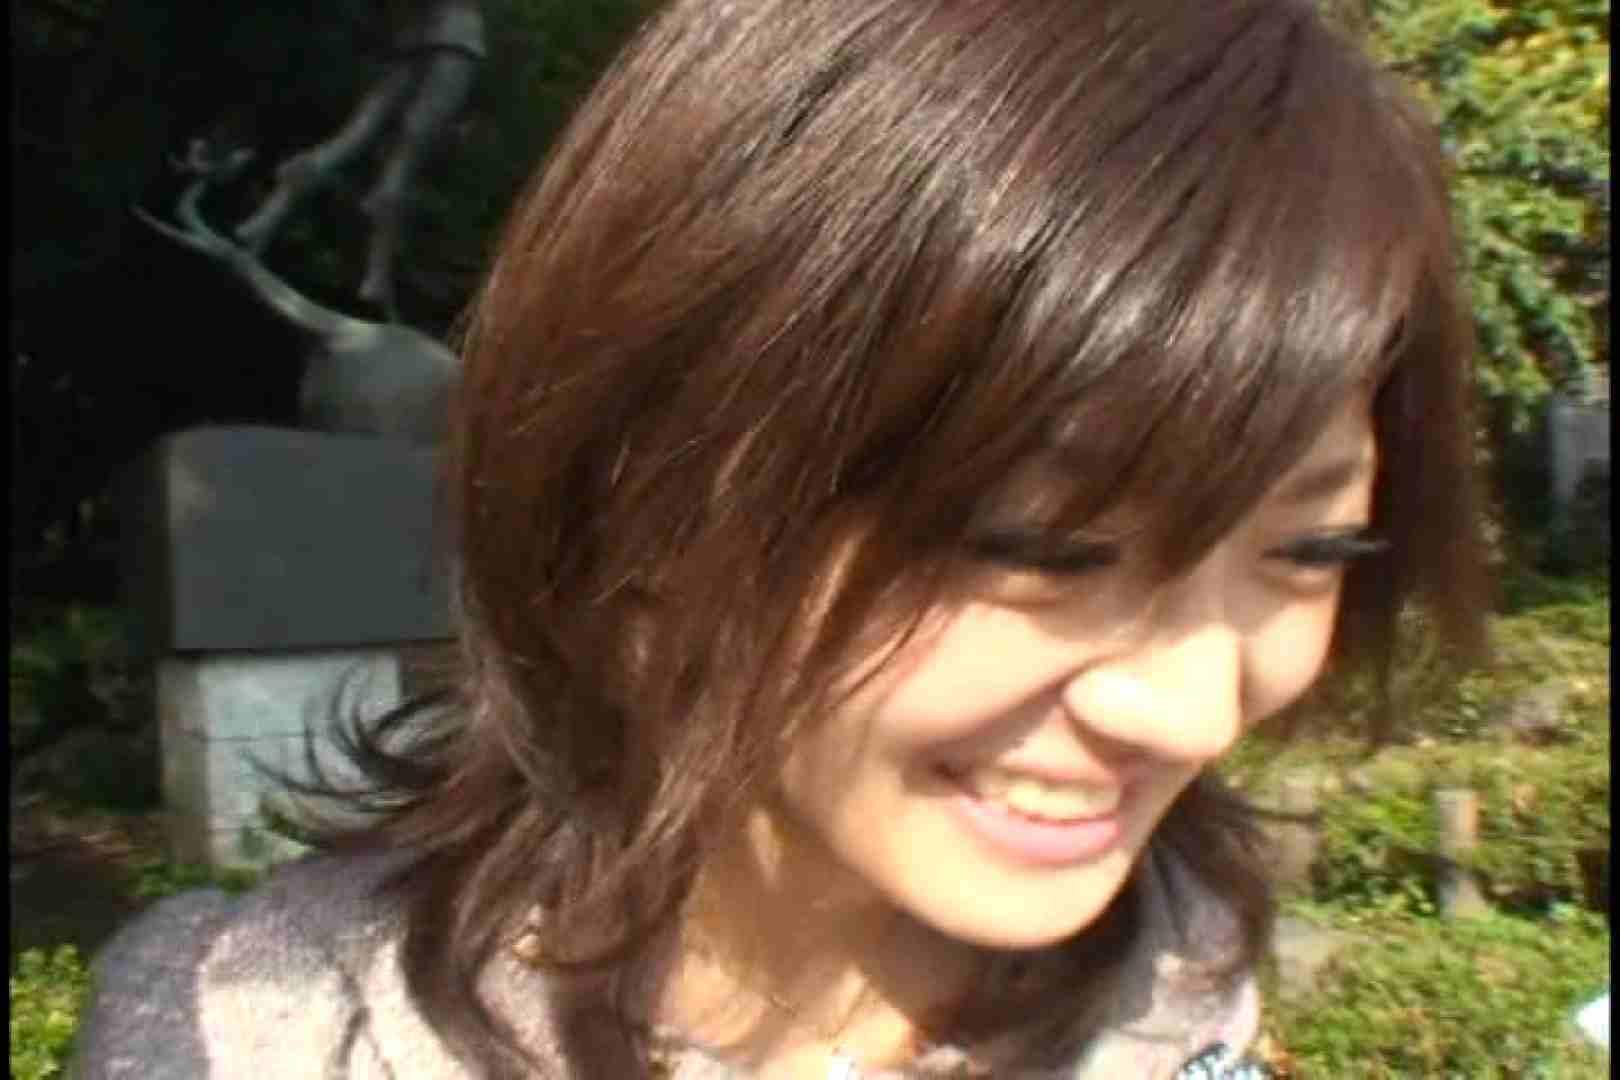 JDハンター全国ツアー vol.035 前編 女子大生のエロ動画 | 0  110PIX 35